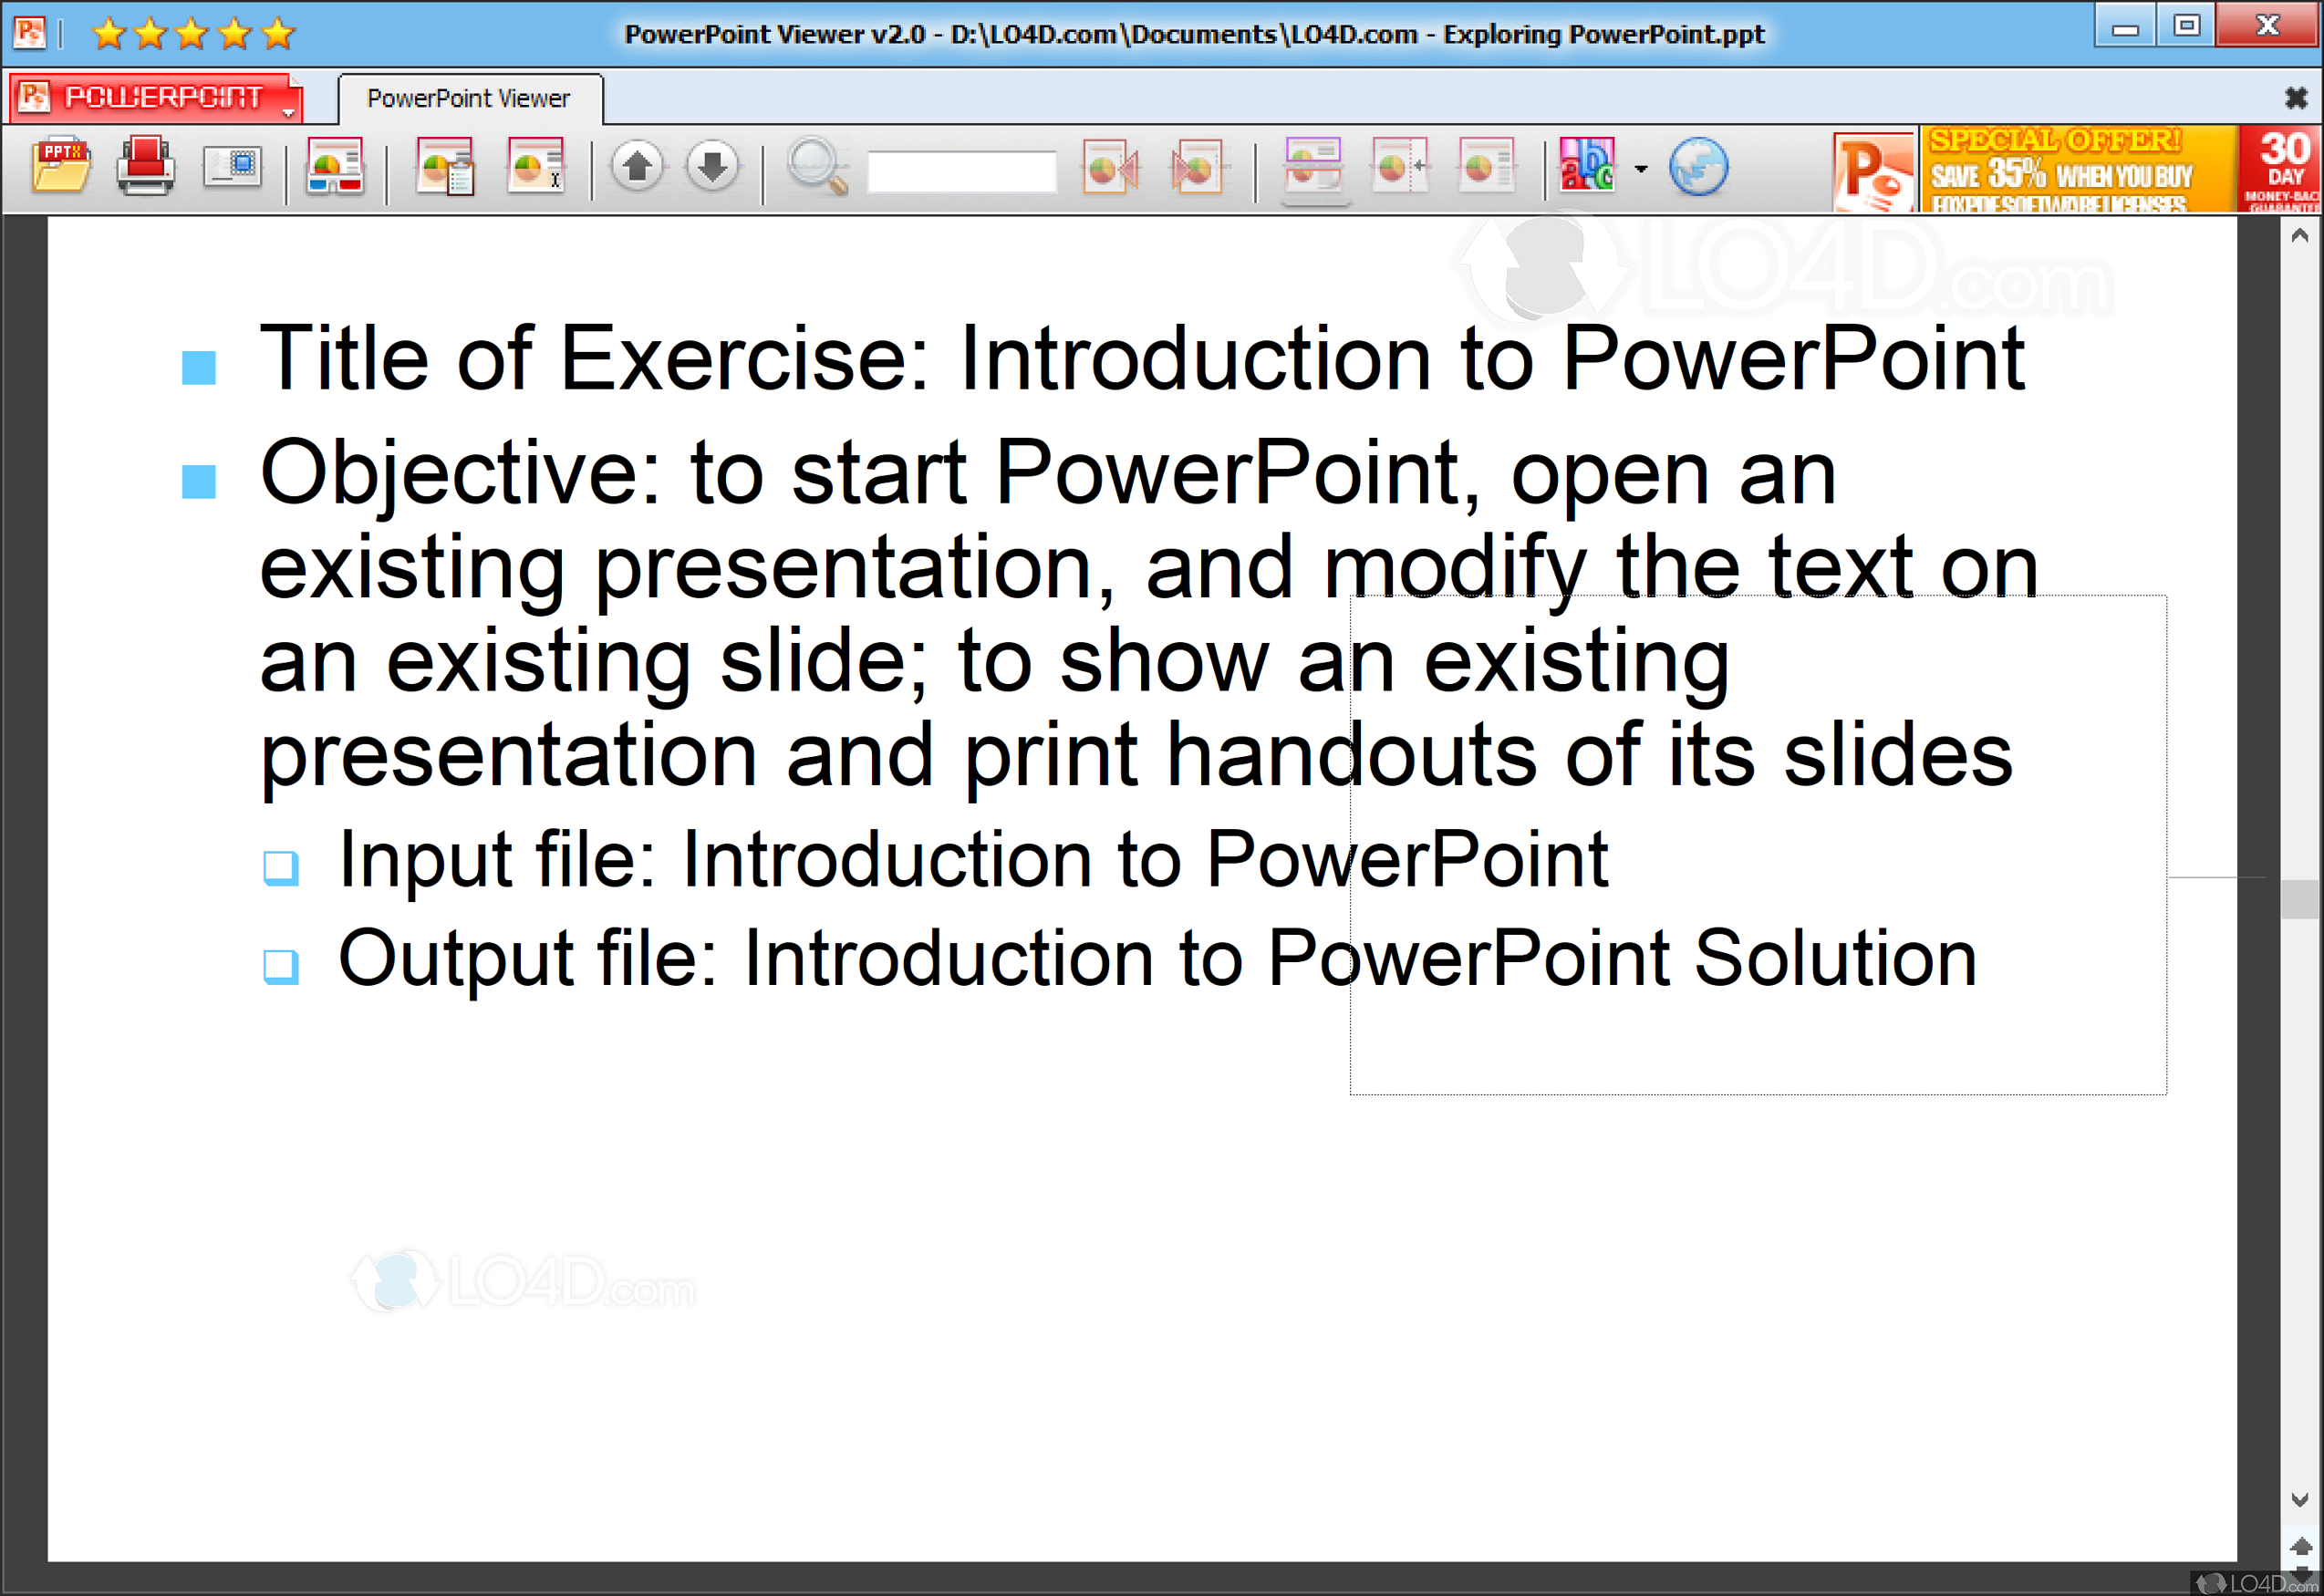 Powerpoint viewer 2010 download.